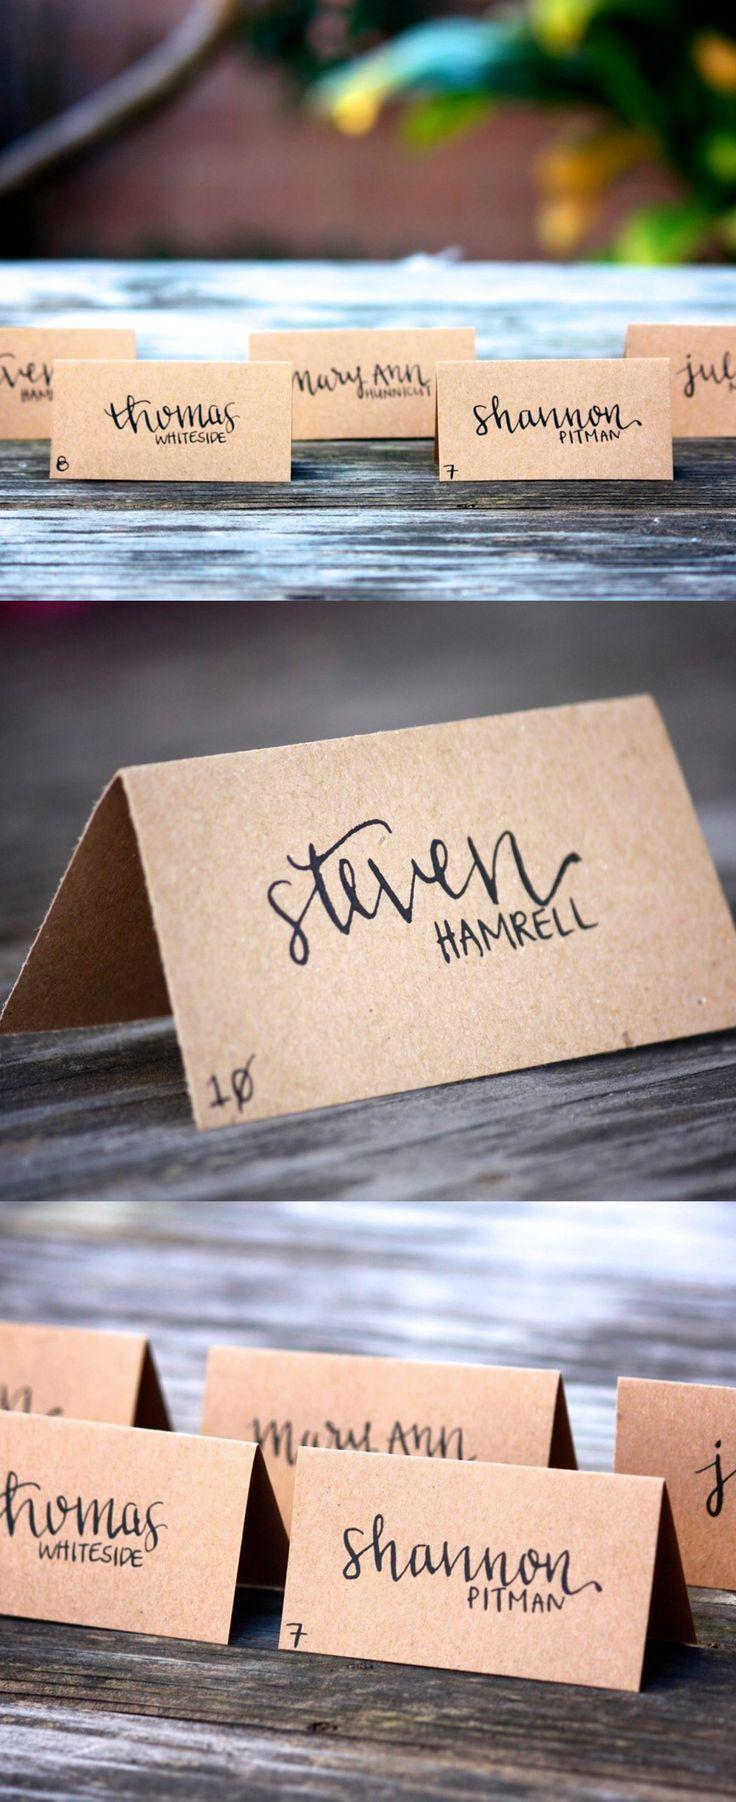 PLACE CARD WEDDING DECOR IDEAS  Wedding Place Cards  Tent Fold  Escort Card  Black